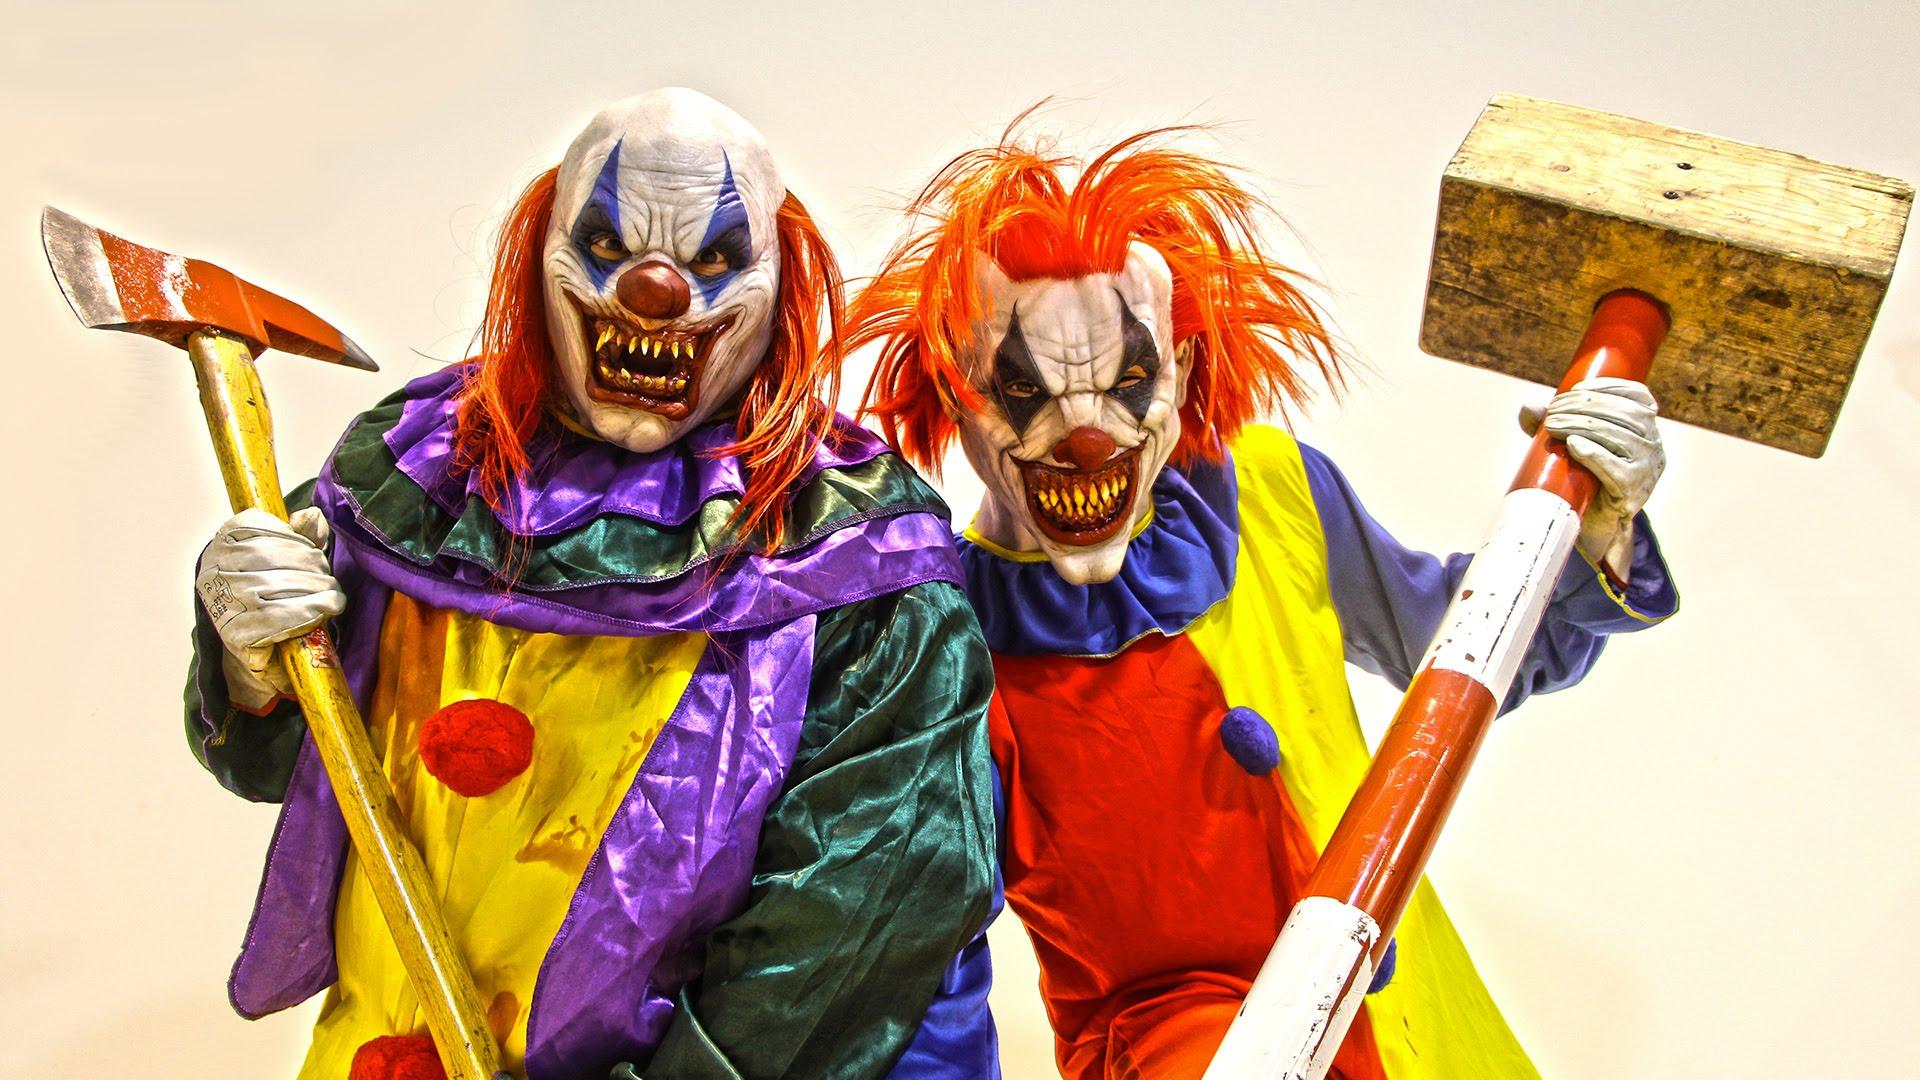 HQ Clown Wallpapers | File 392.55Kb